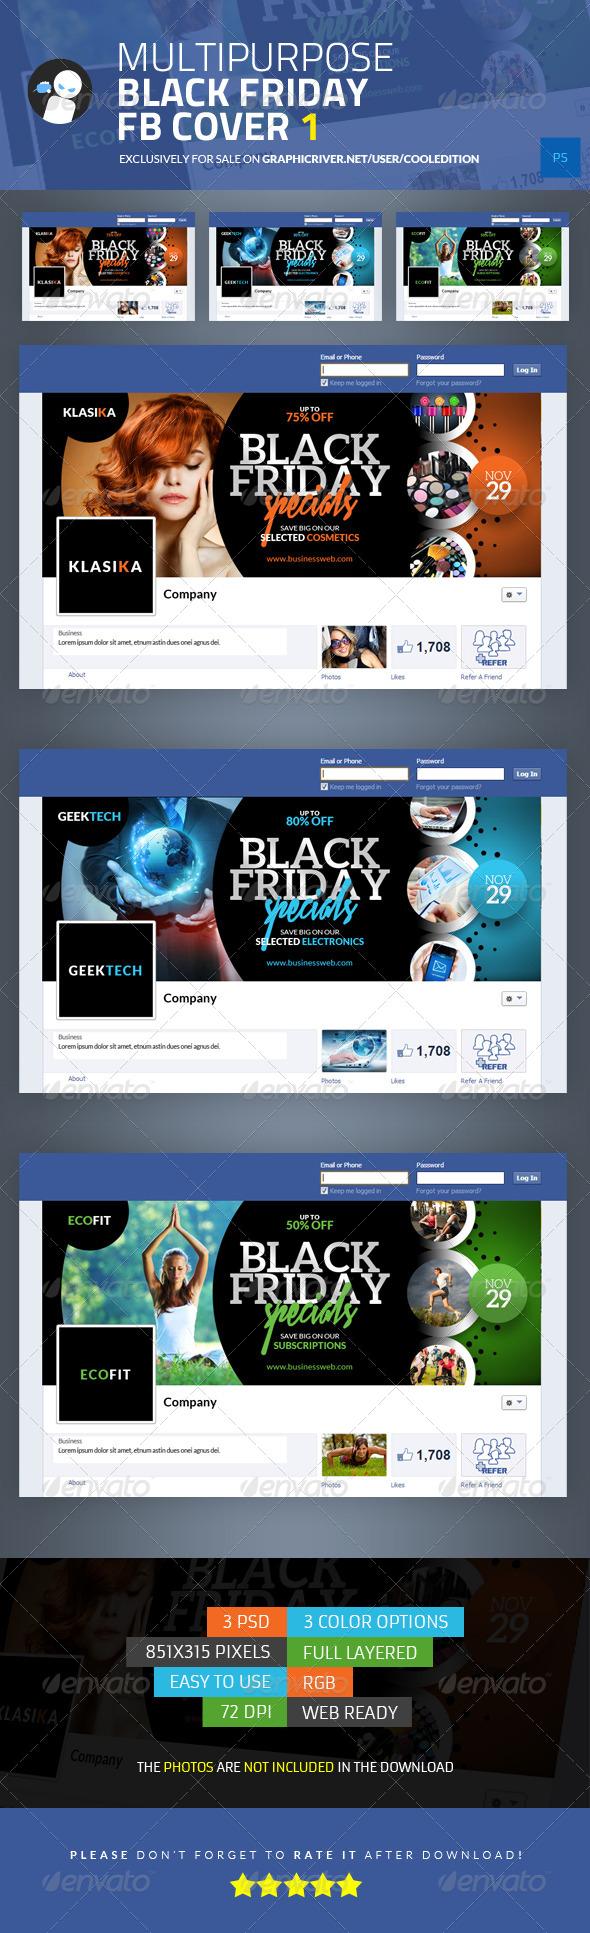 Multipurpose Black Friday Facebook Cover 1 - Facebook Timeline Covers Social Media